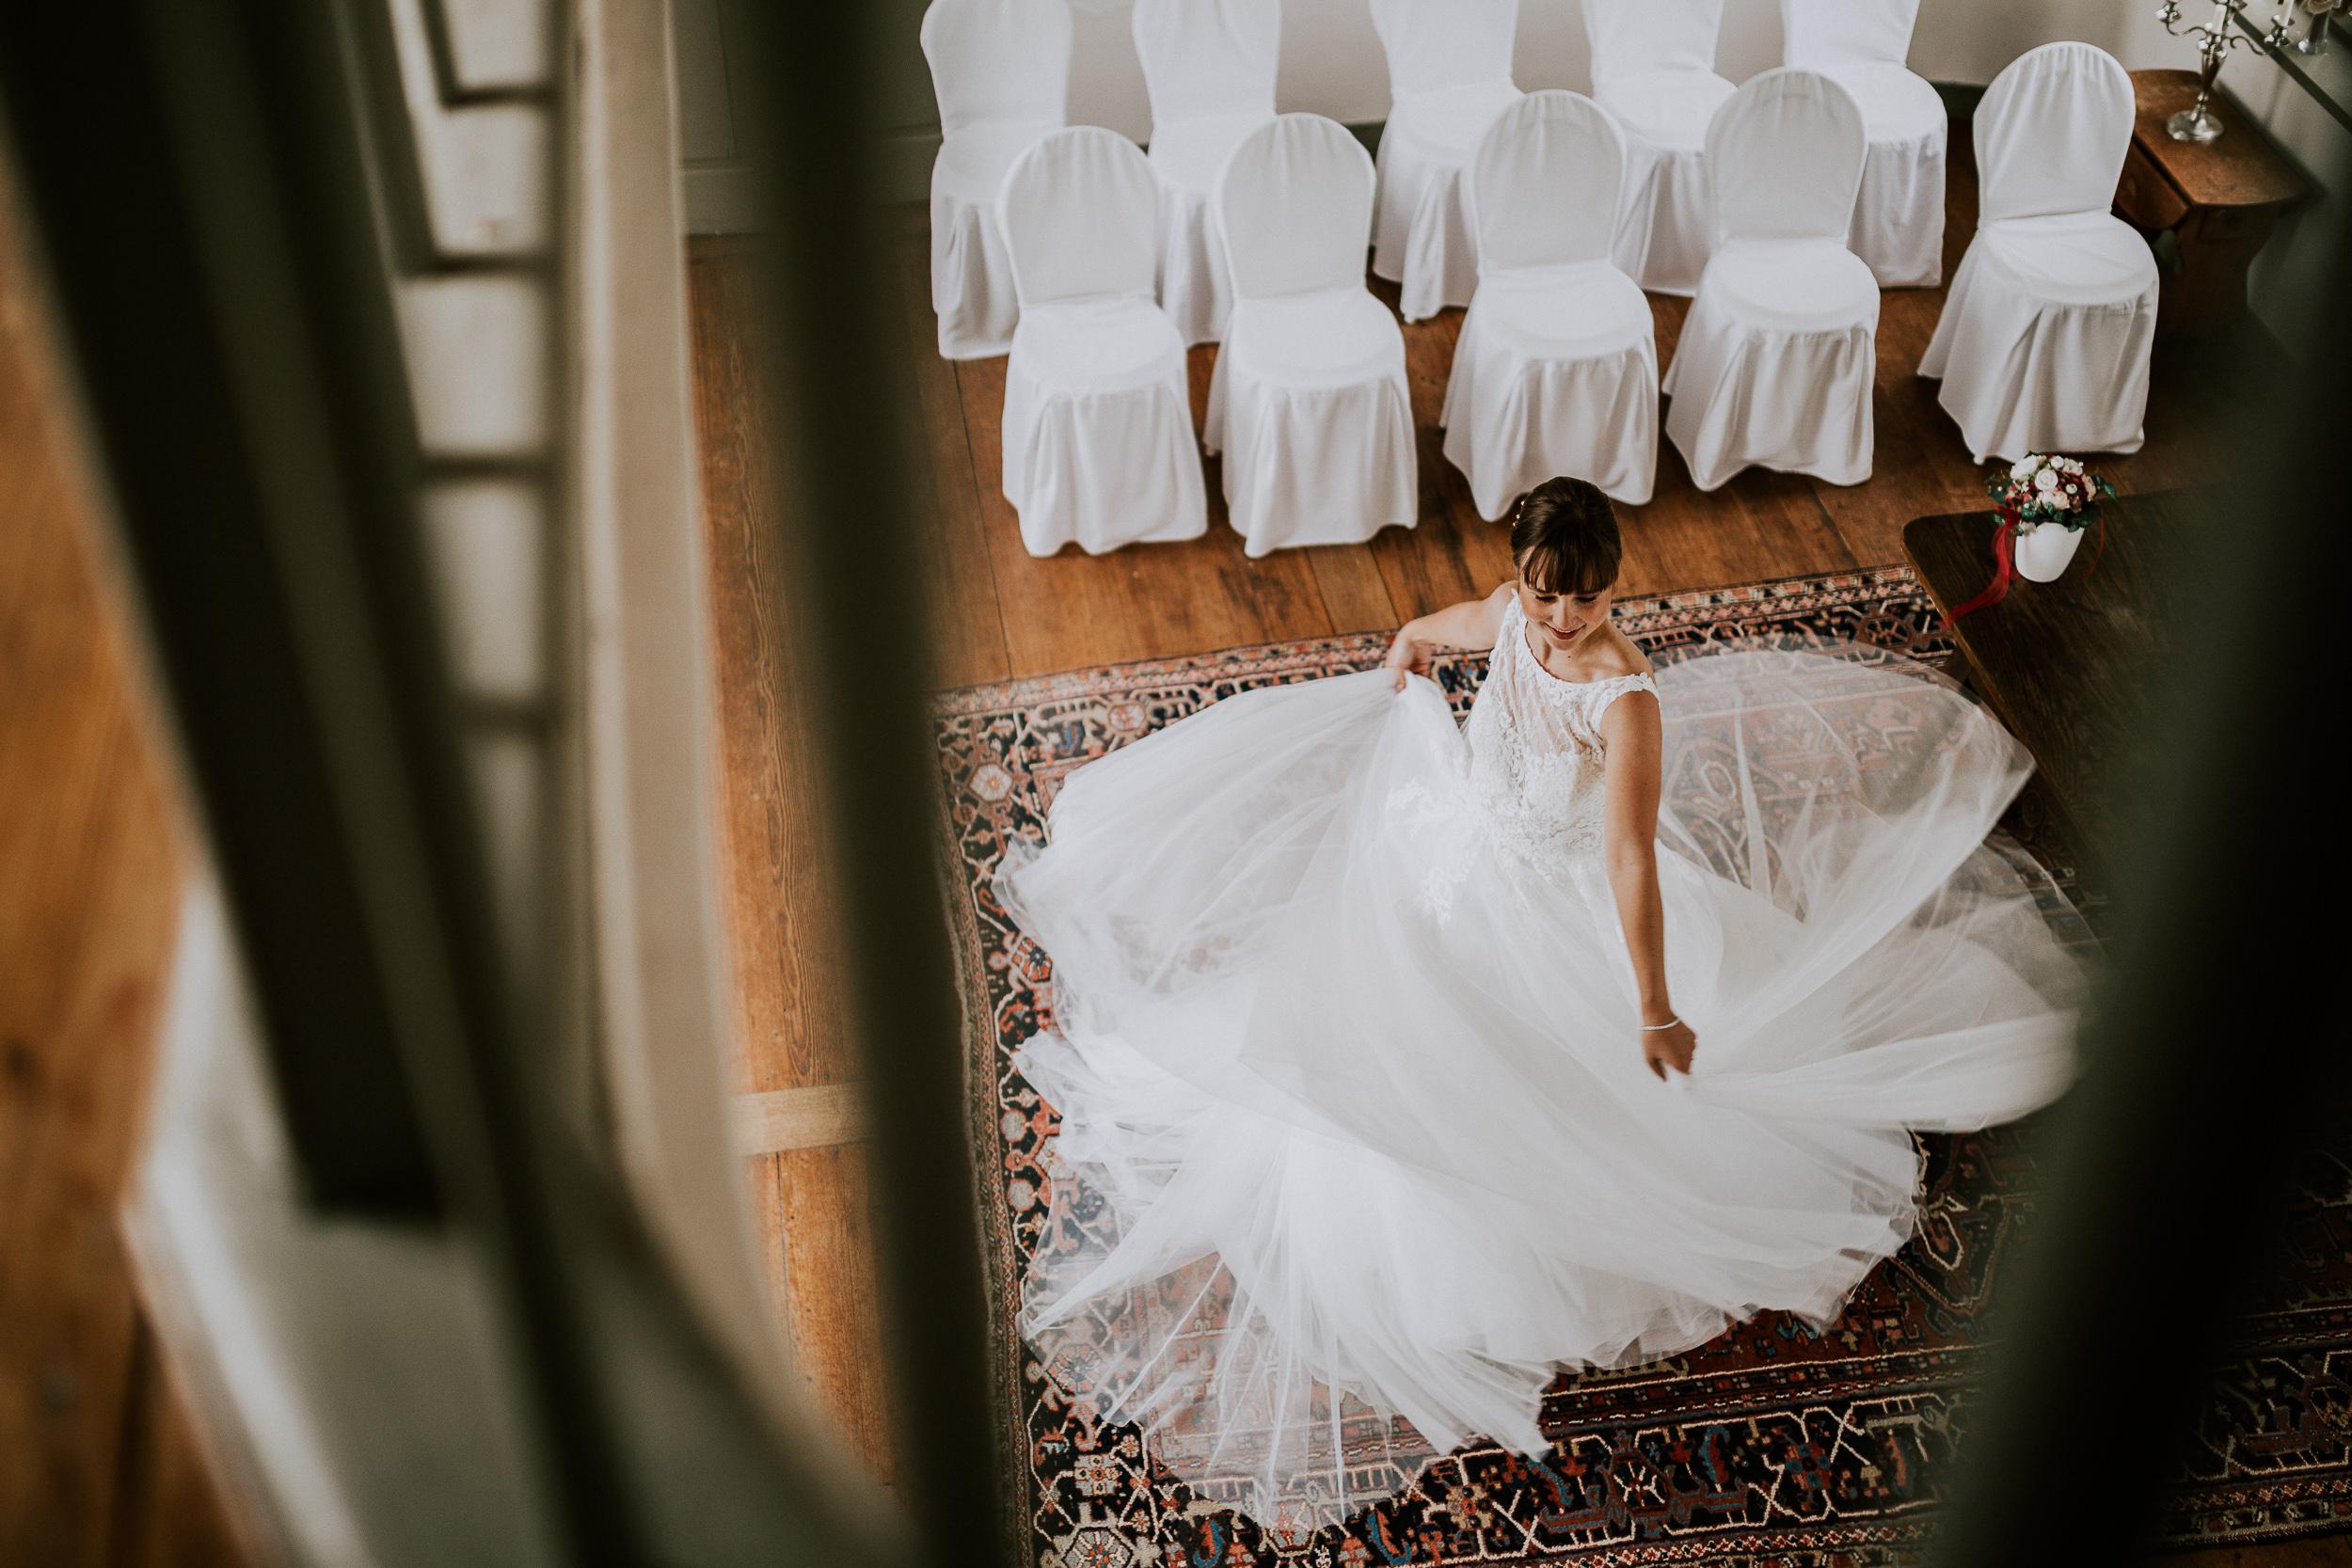 Hochzeitsfotograf Anastasia Walther_Crailsheim, Ellwangen, Heidenheim, Aalen_ schloss hohenstadt-0001.jpg